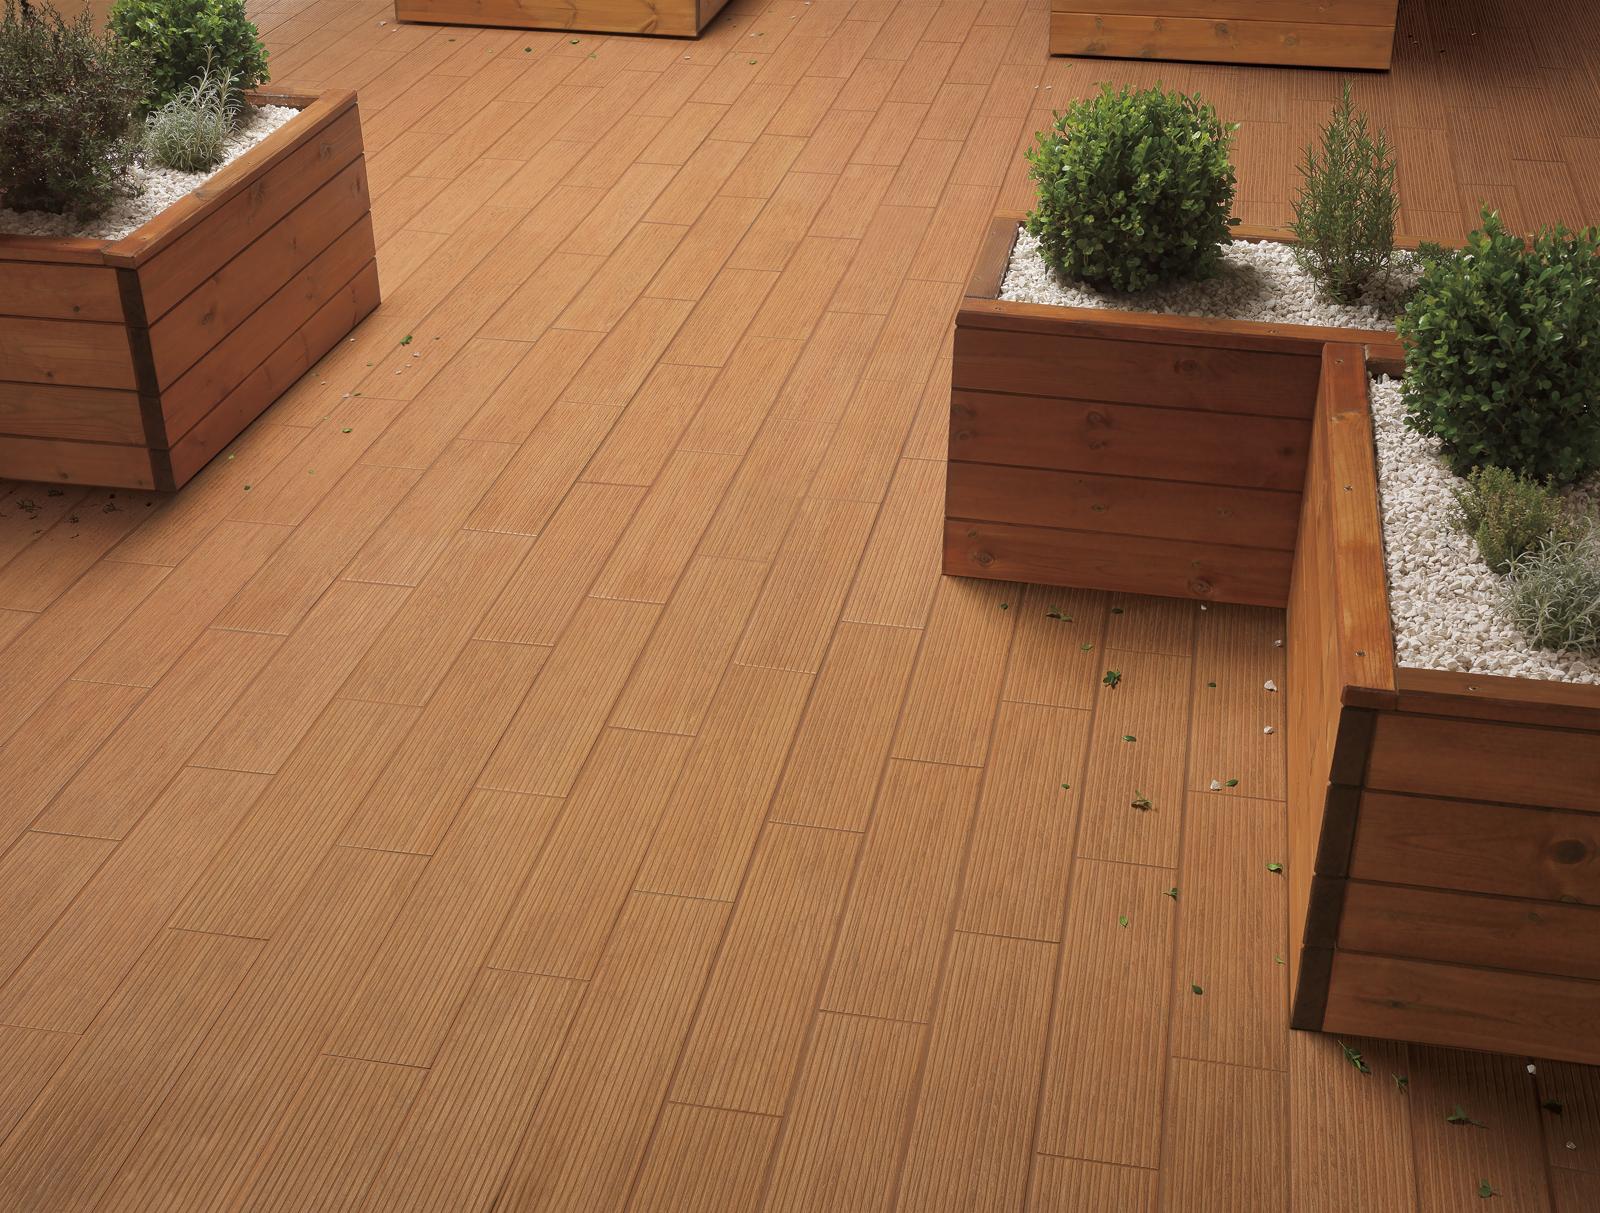 Habitat gres porcel nico imitaci n madera marazzi - Ceramica imitacion madera exterior ...